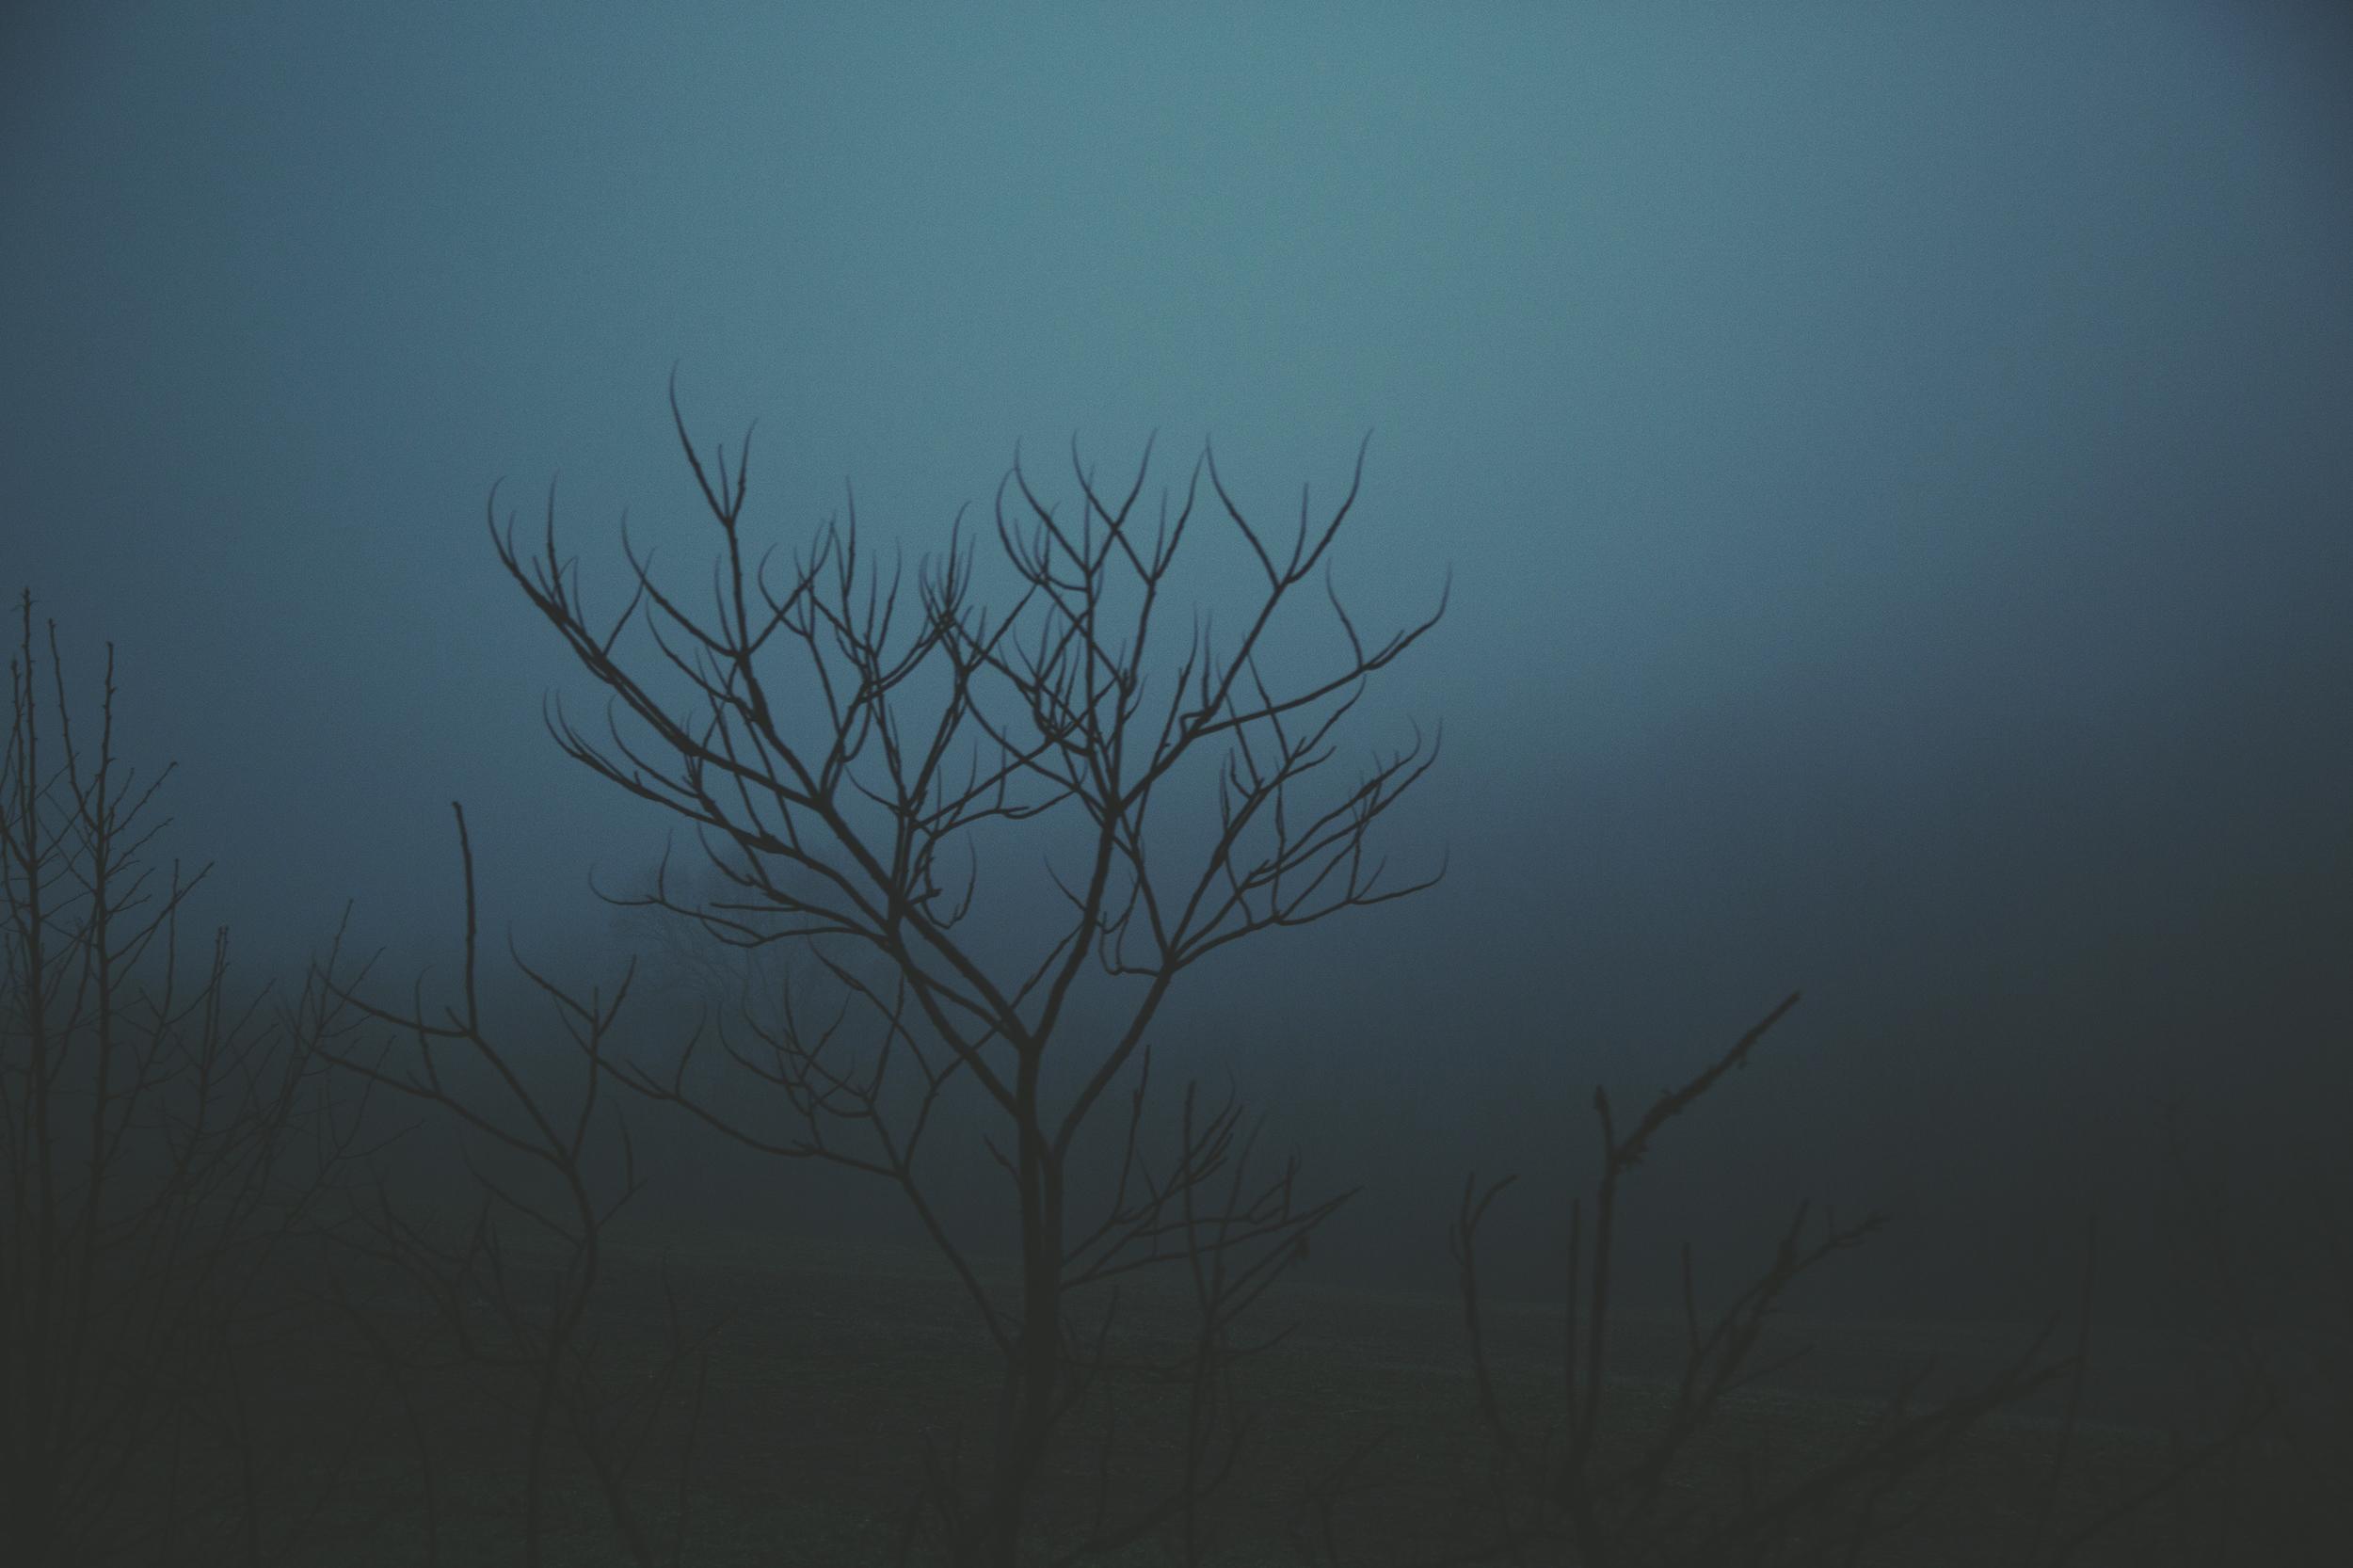 landscape-9.jpg